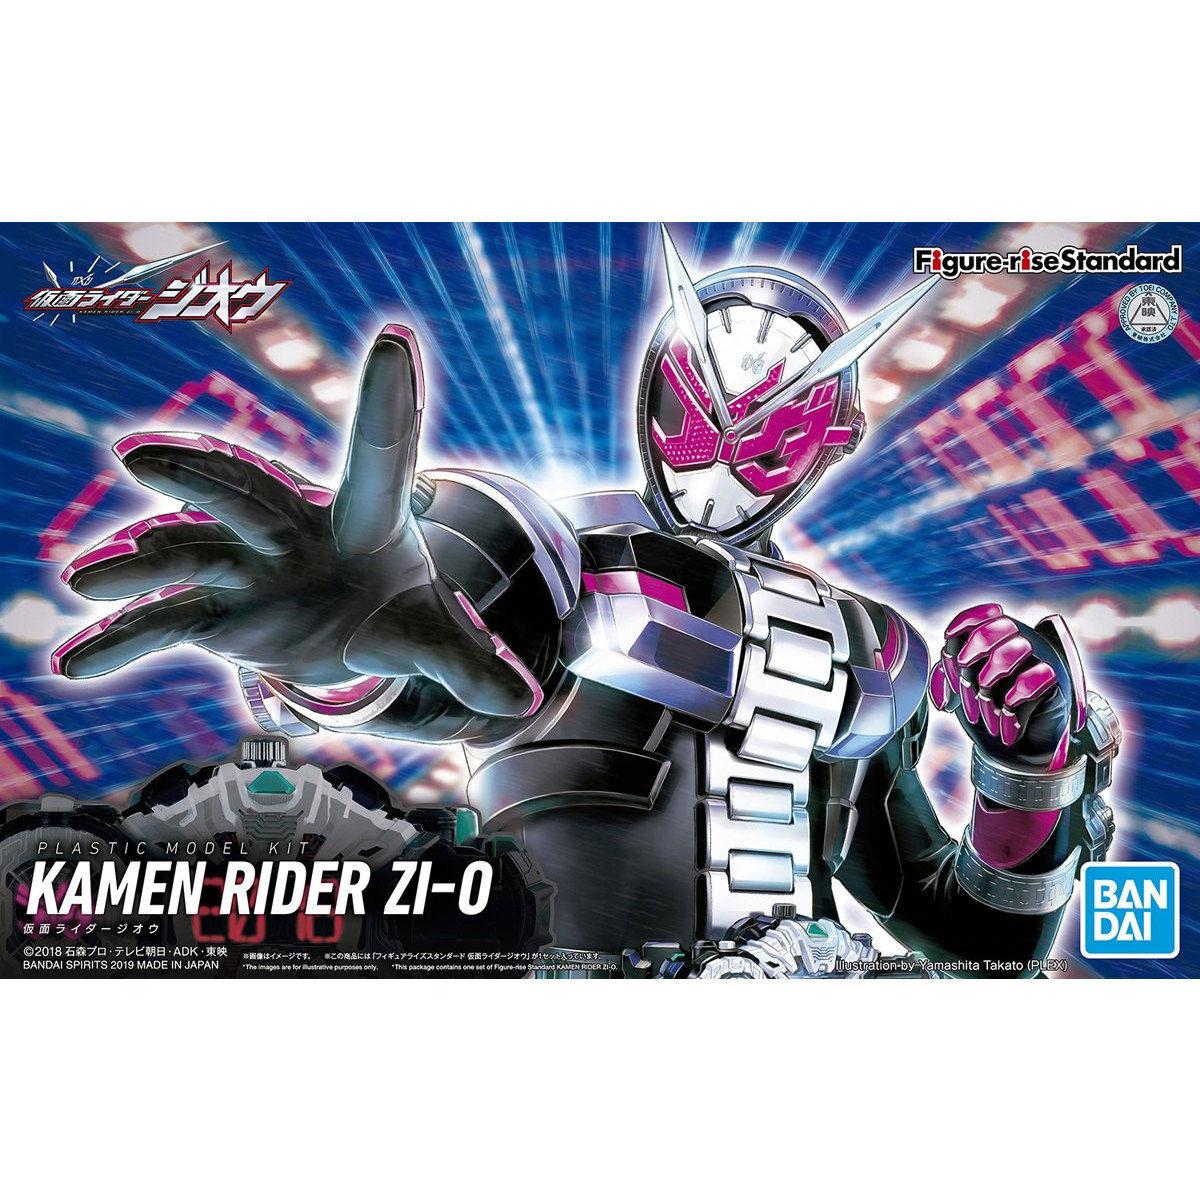 "Bandai Kamen Rider Zi-0 ""Kamen Rider"", Bandai Figure-rise Standard"